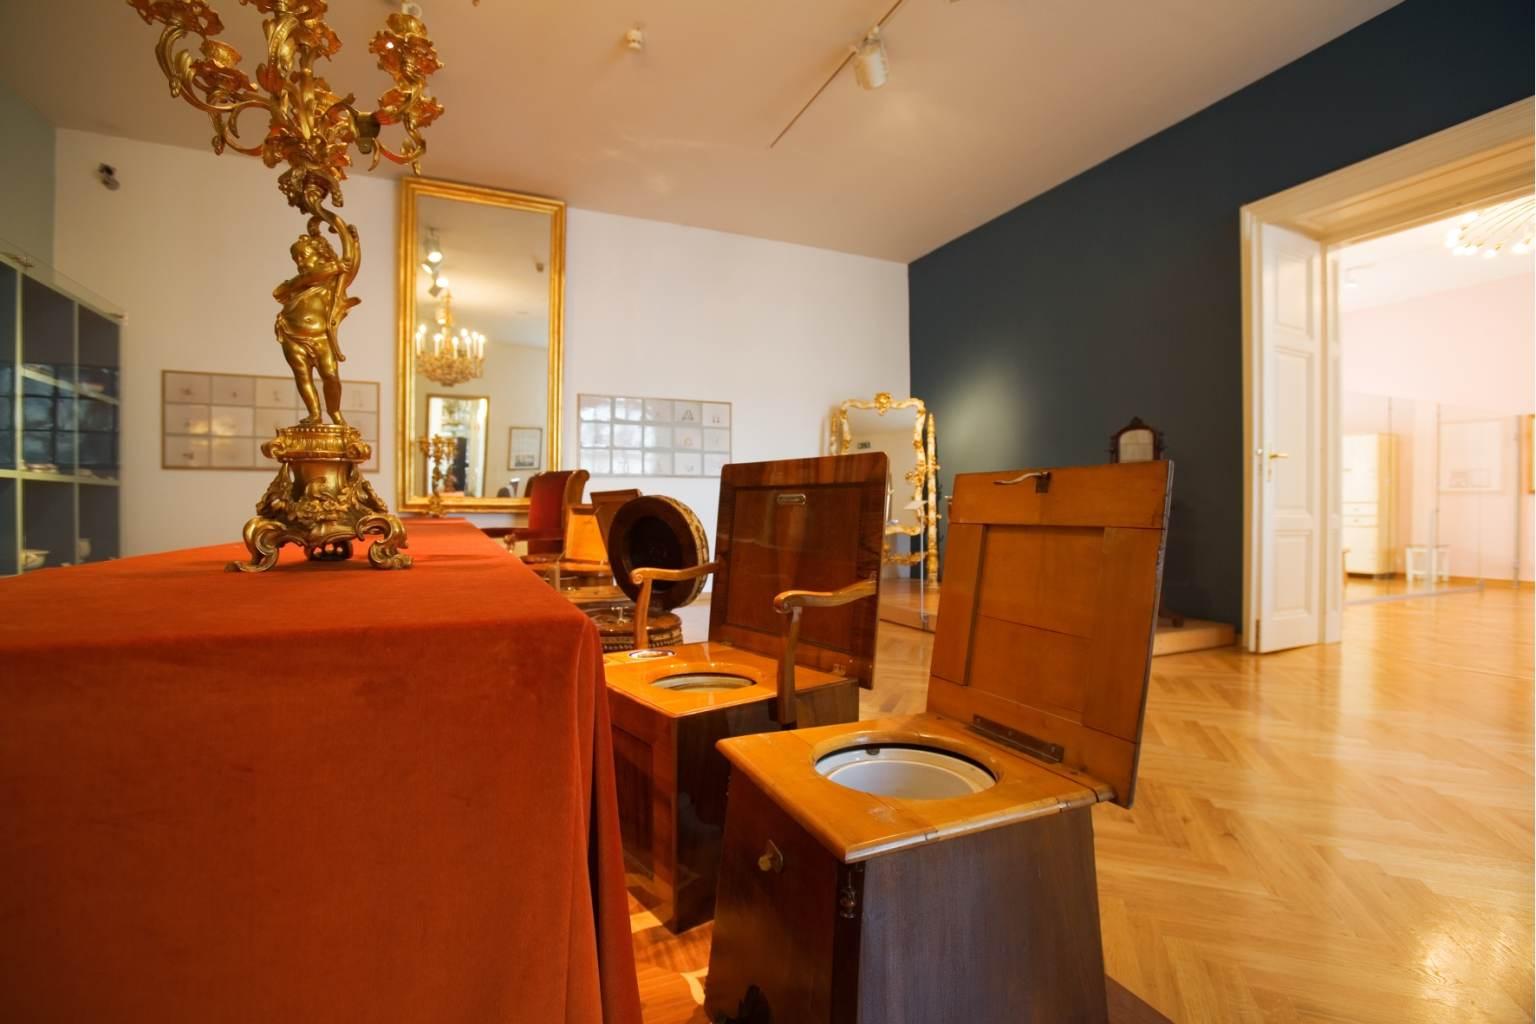 Schloß Schönbrunn Kultur  Und Betriebsges.m.b.H / Hofmobiliendepot  Kategorie: Intime Zeugen